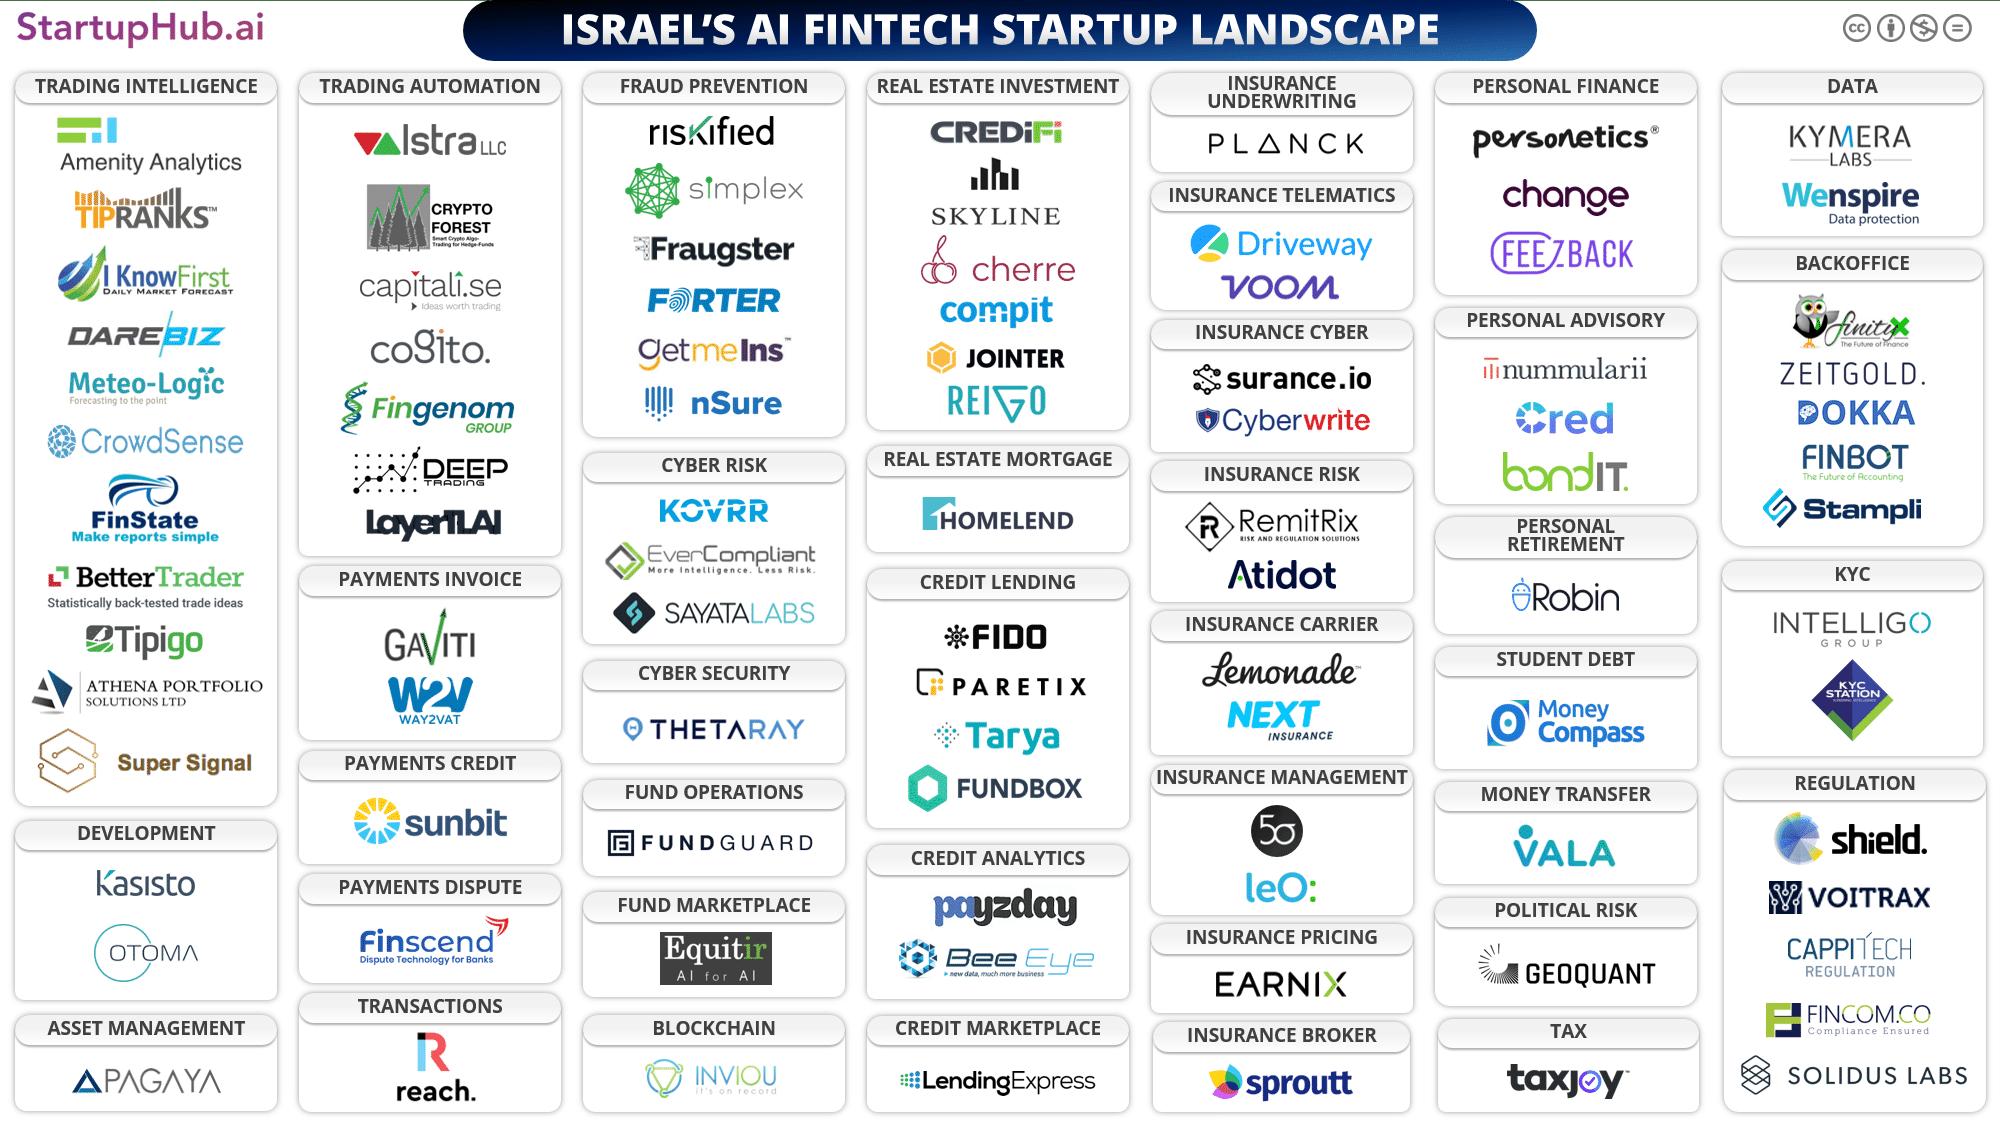 Israel's AI Fintech Startup Landscape Map 2019